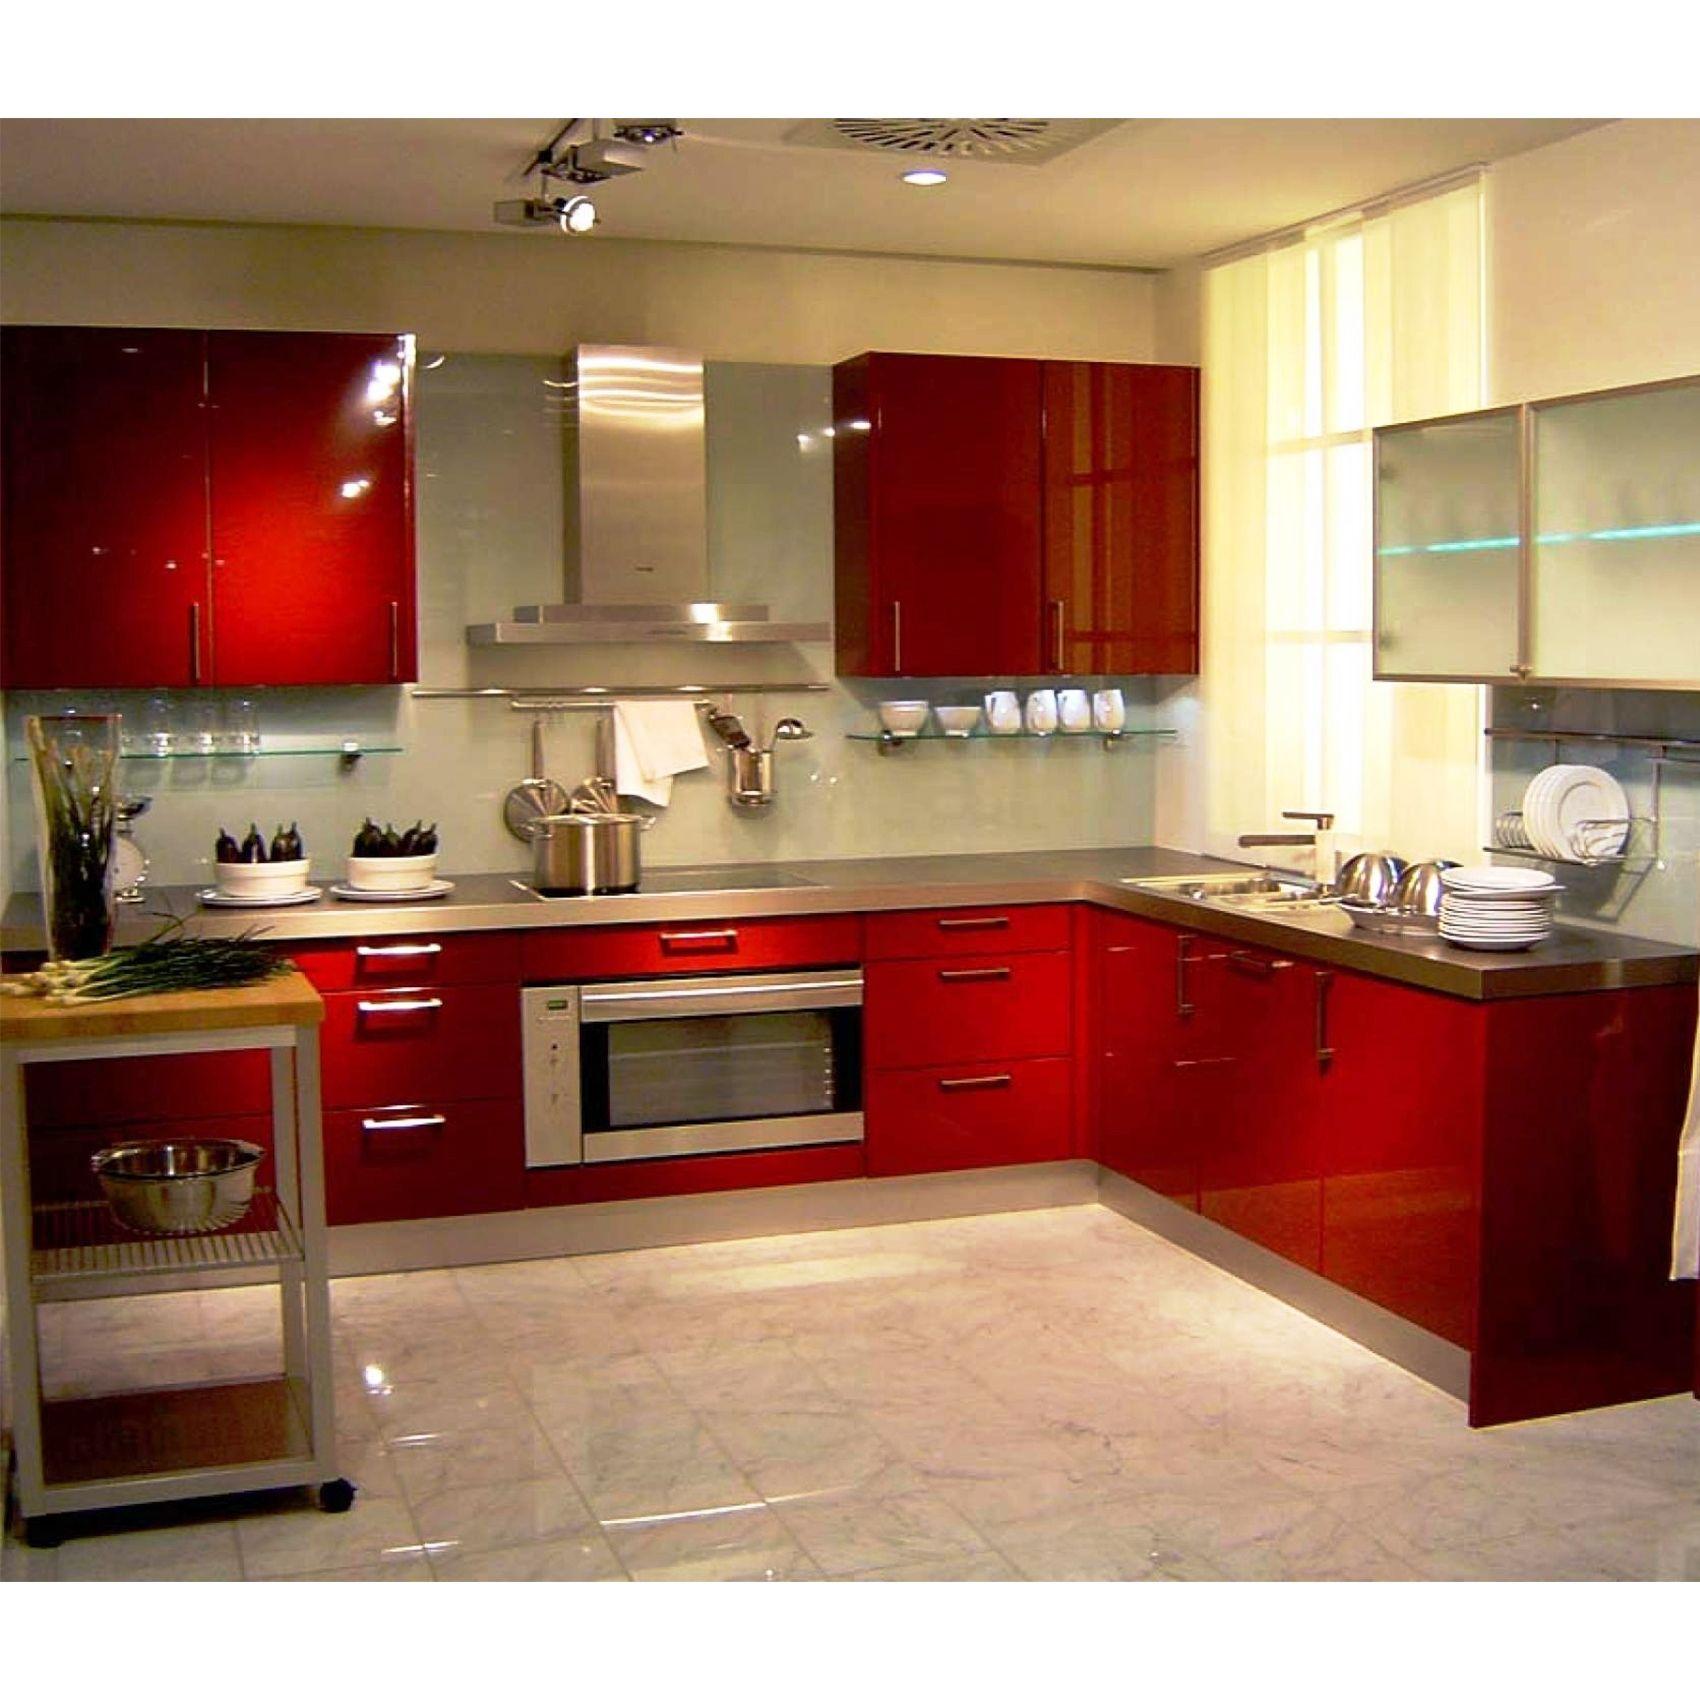 The best modern kitchen design ideas u inspiration to match your